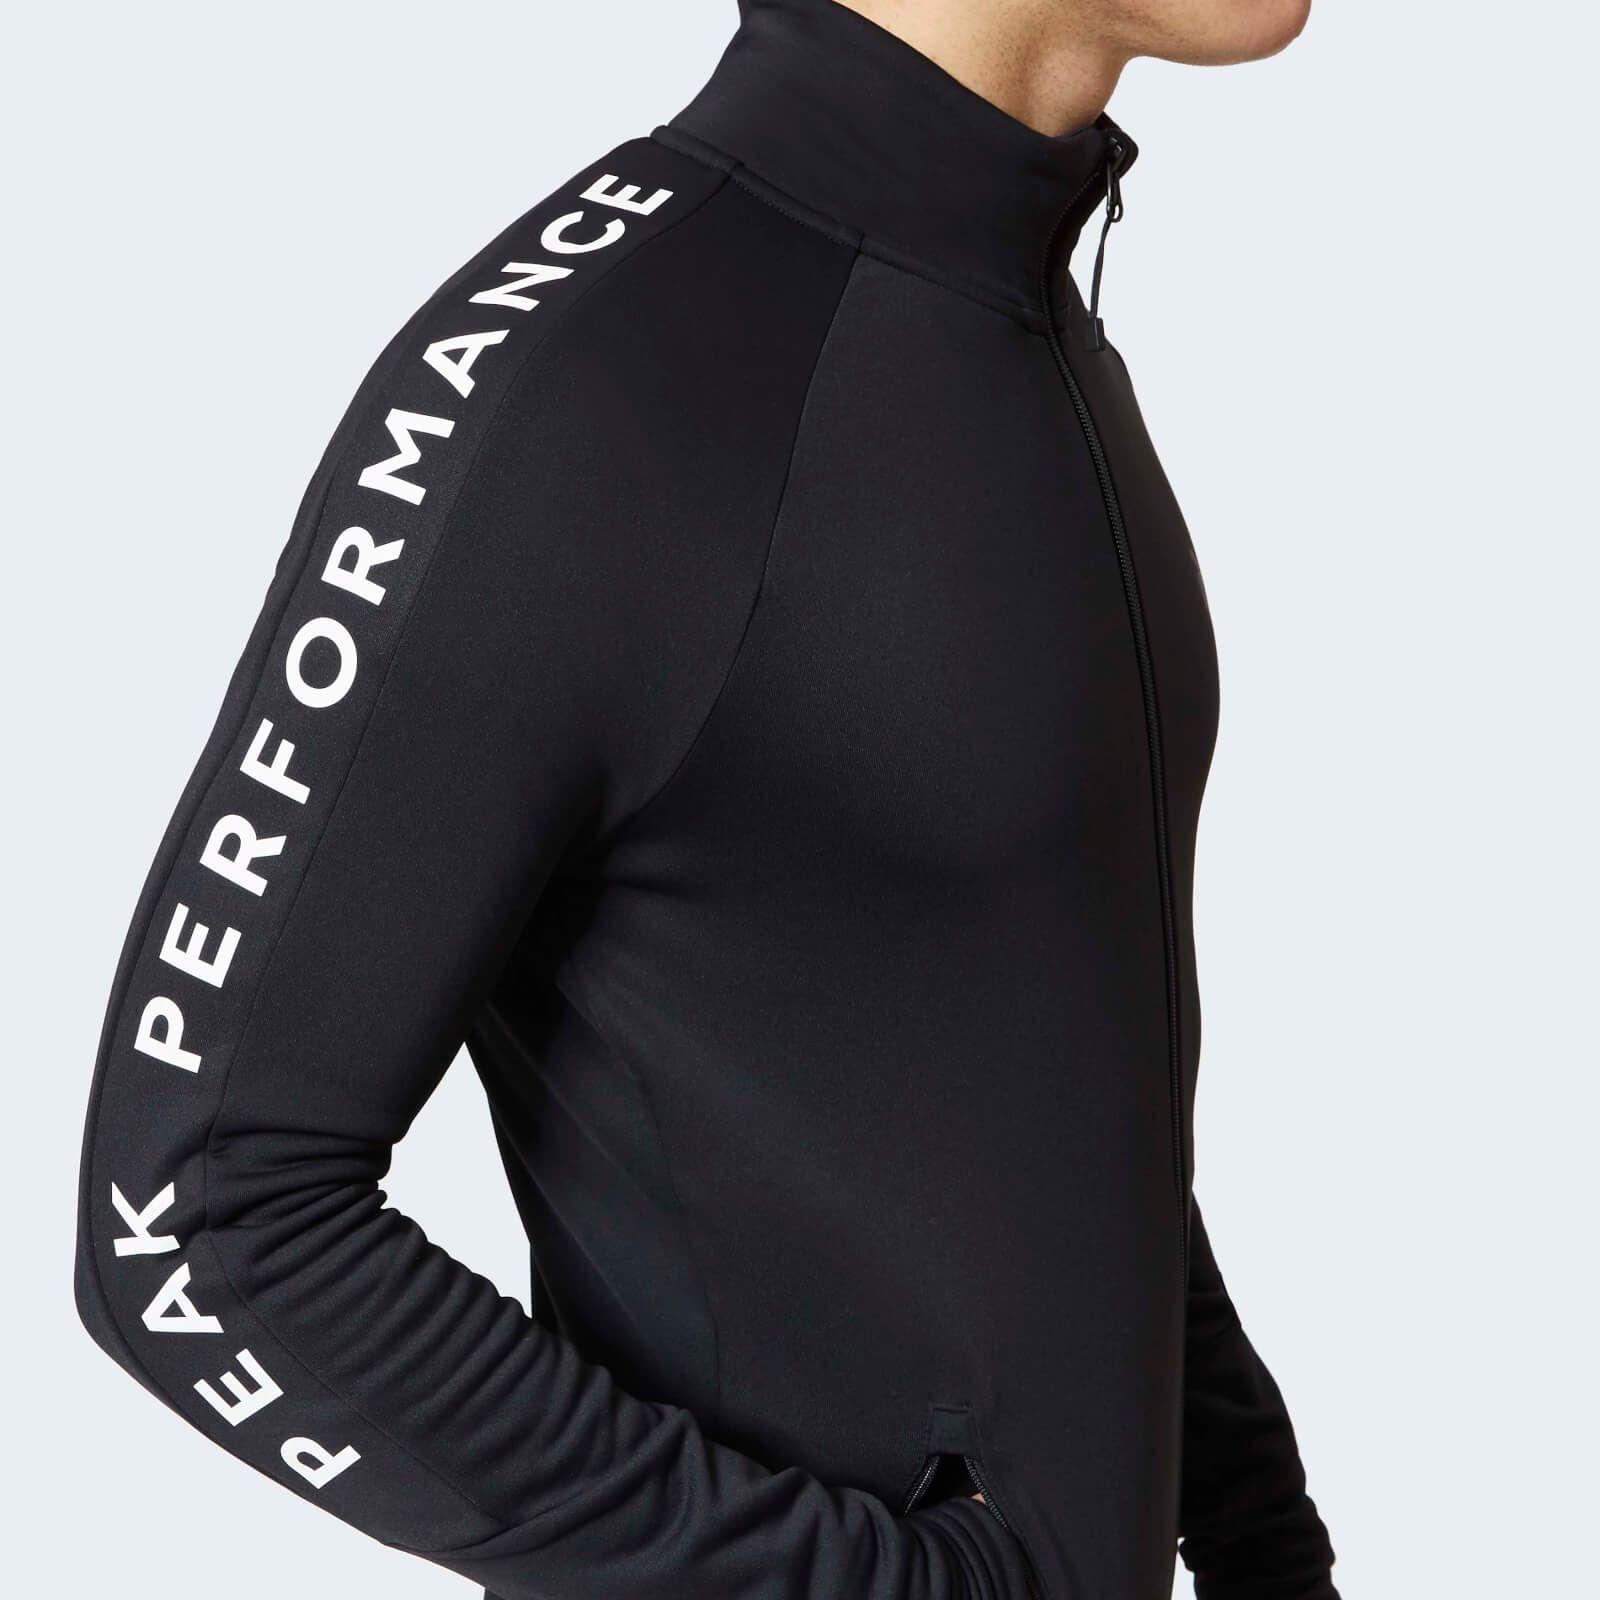 Peak Performance Men Zip Jackets Jacket Brands Casual Jacket